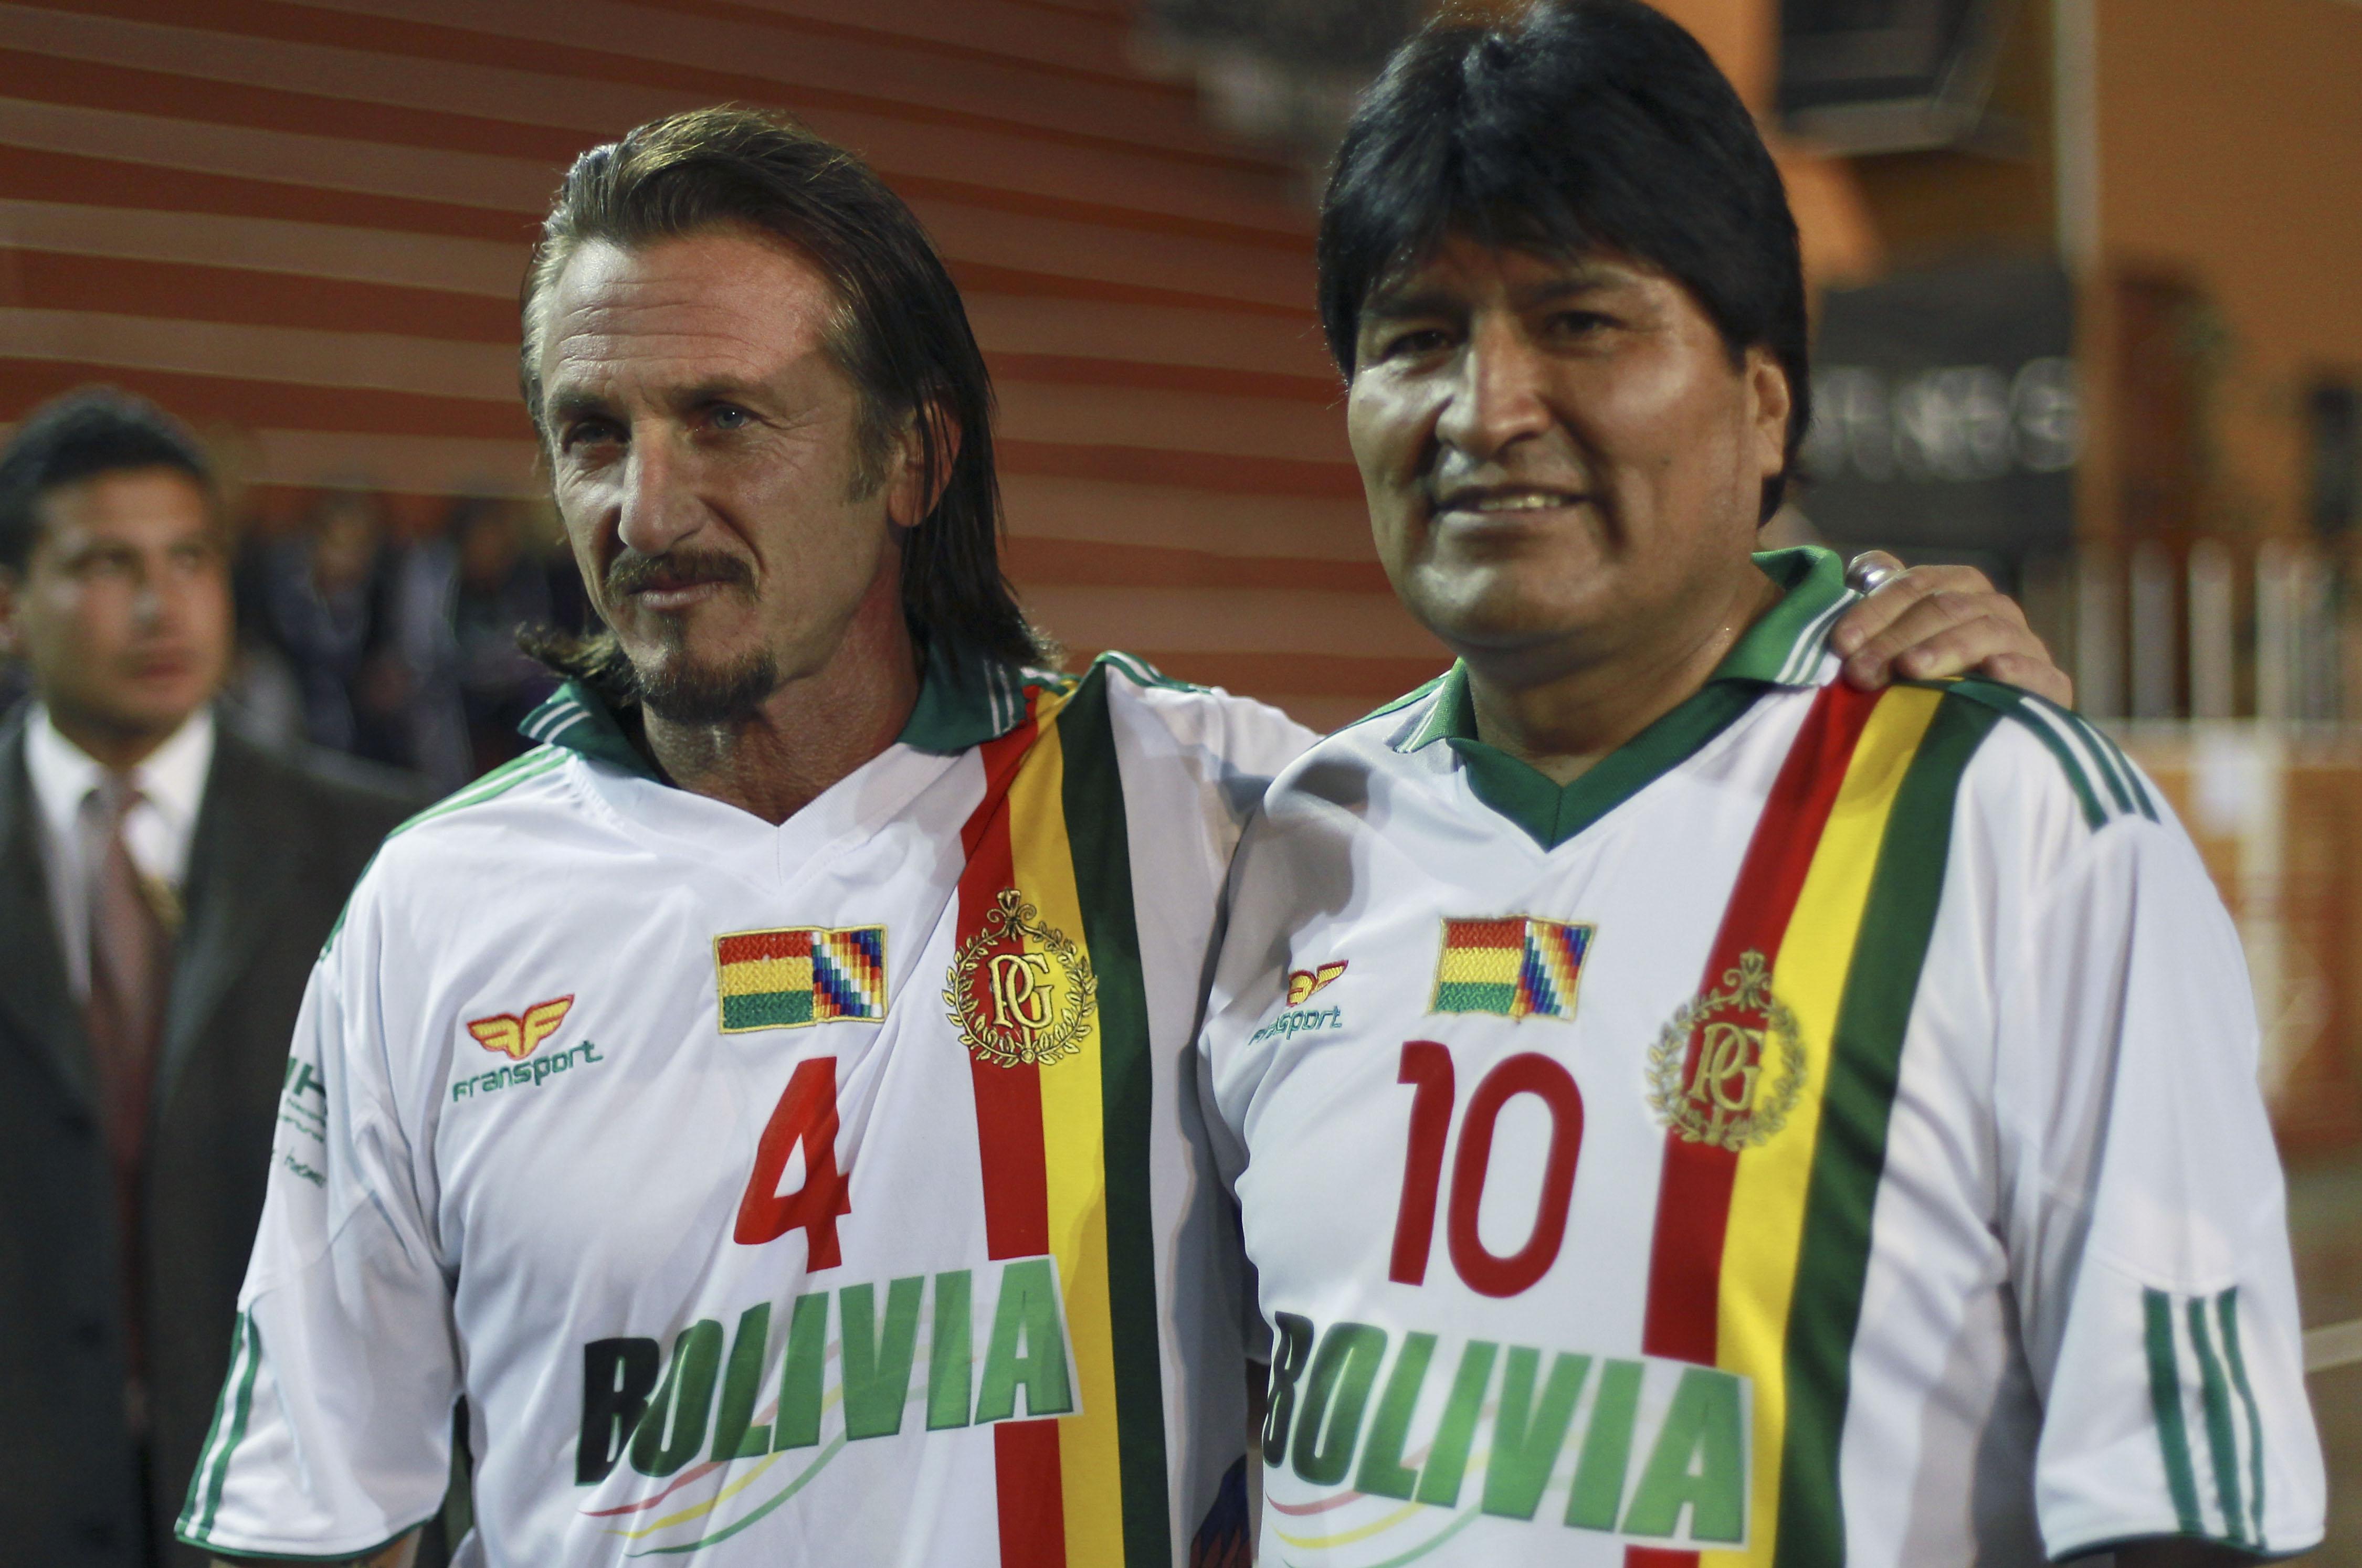 ¿Cuánto mide Evo Morales? - Altura - Real height Bolivia-sean-penn_lea